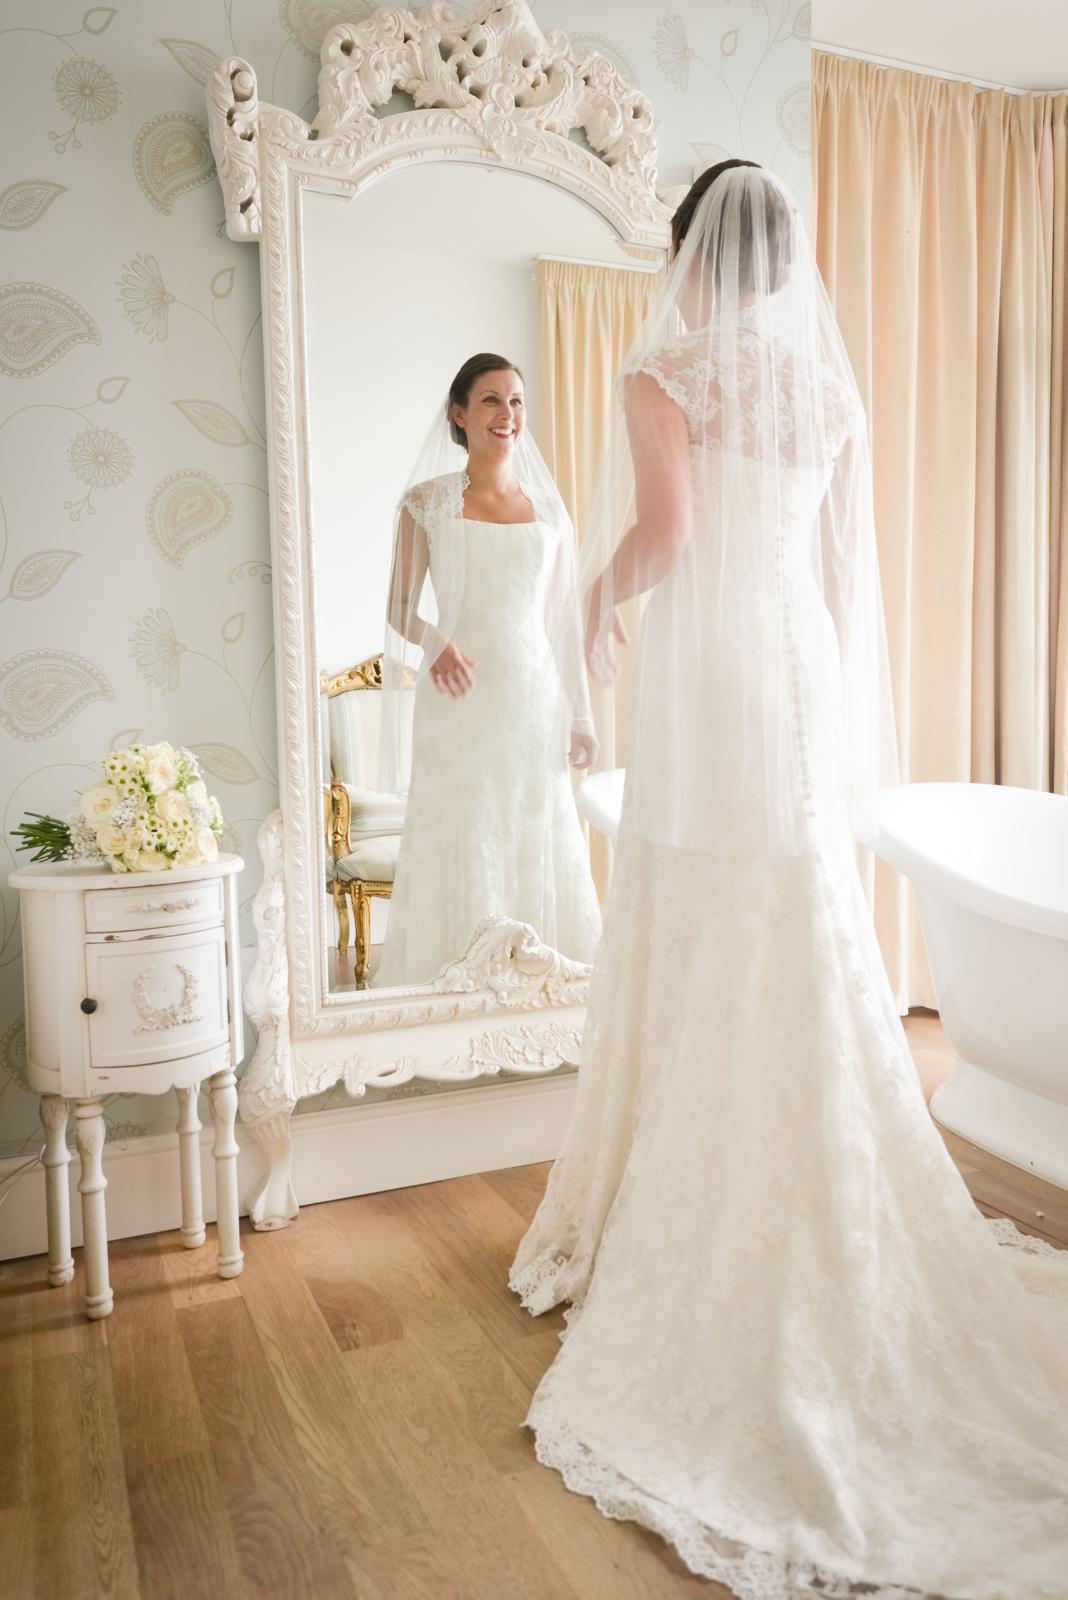 watergate-bay-hotel-wedding-photography-25.jpg